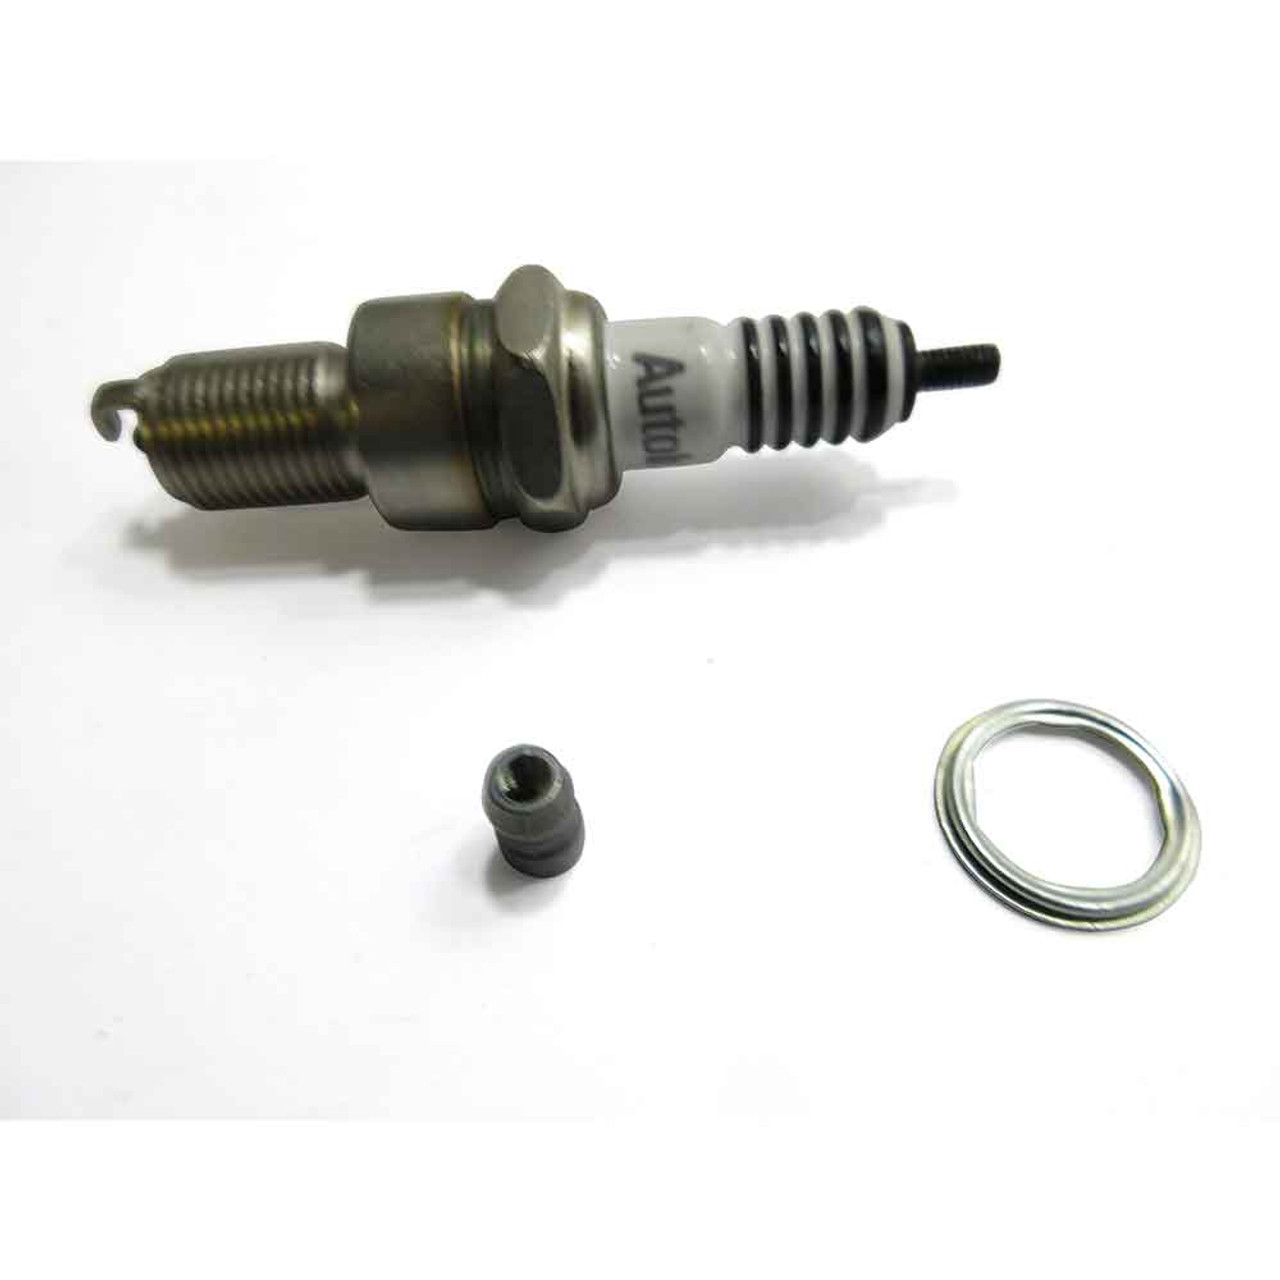 Autolite 53 Copper Core Racing Spark Plug Medium Heat